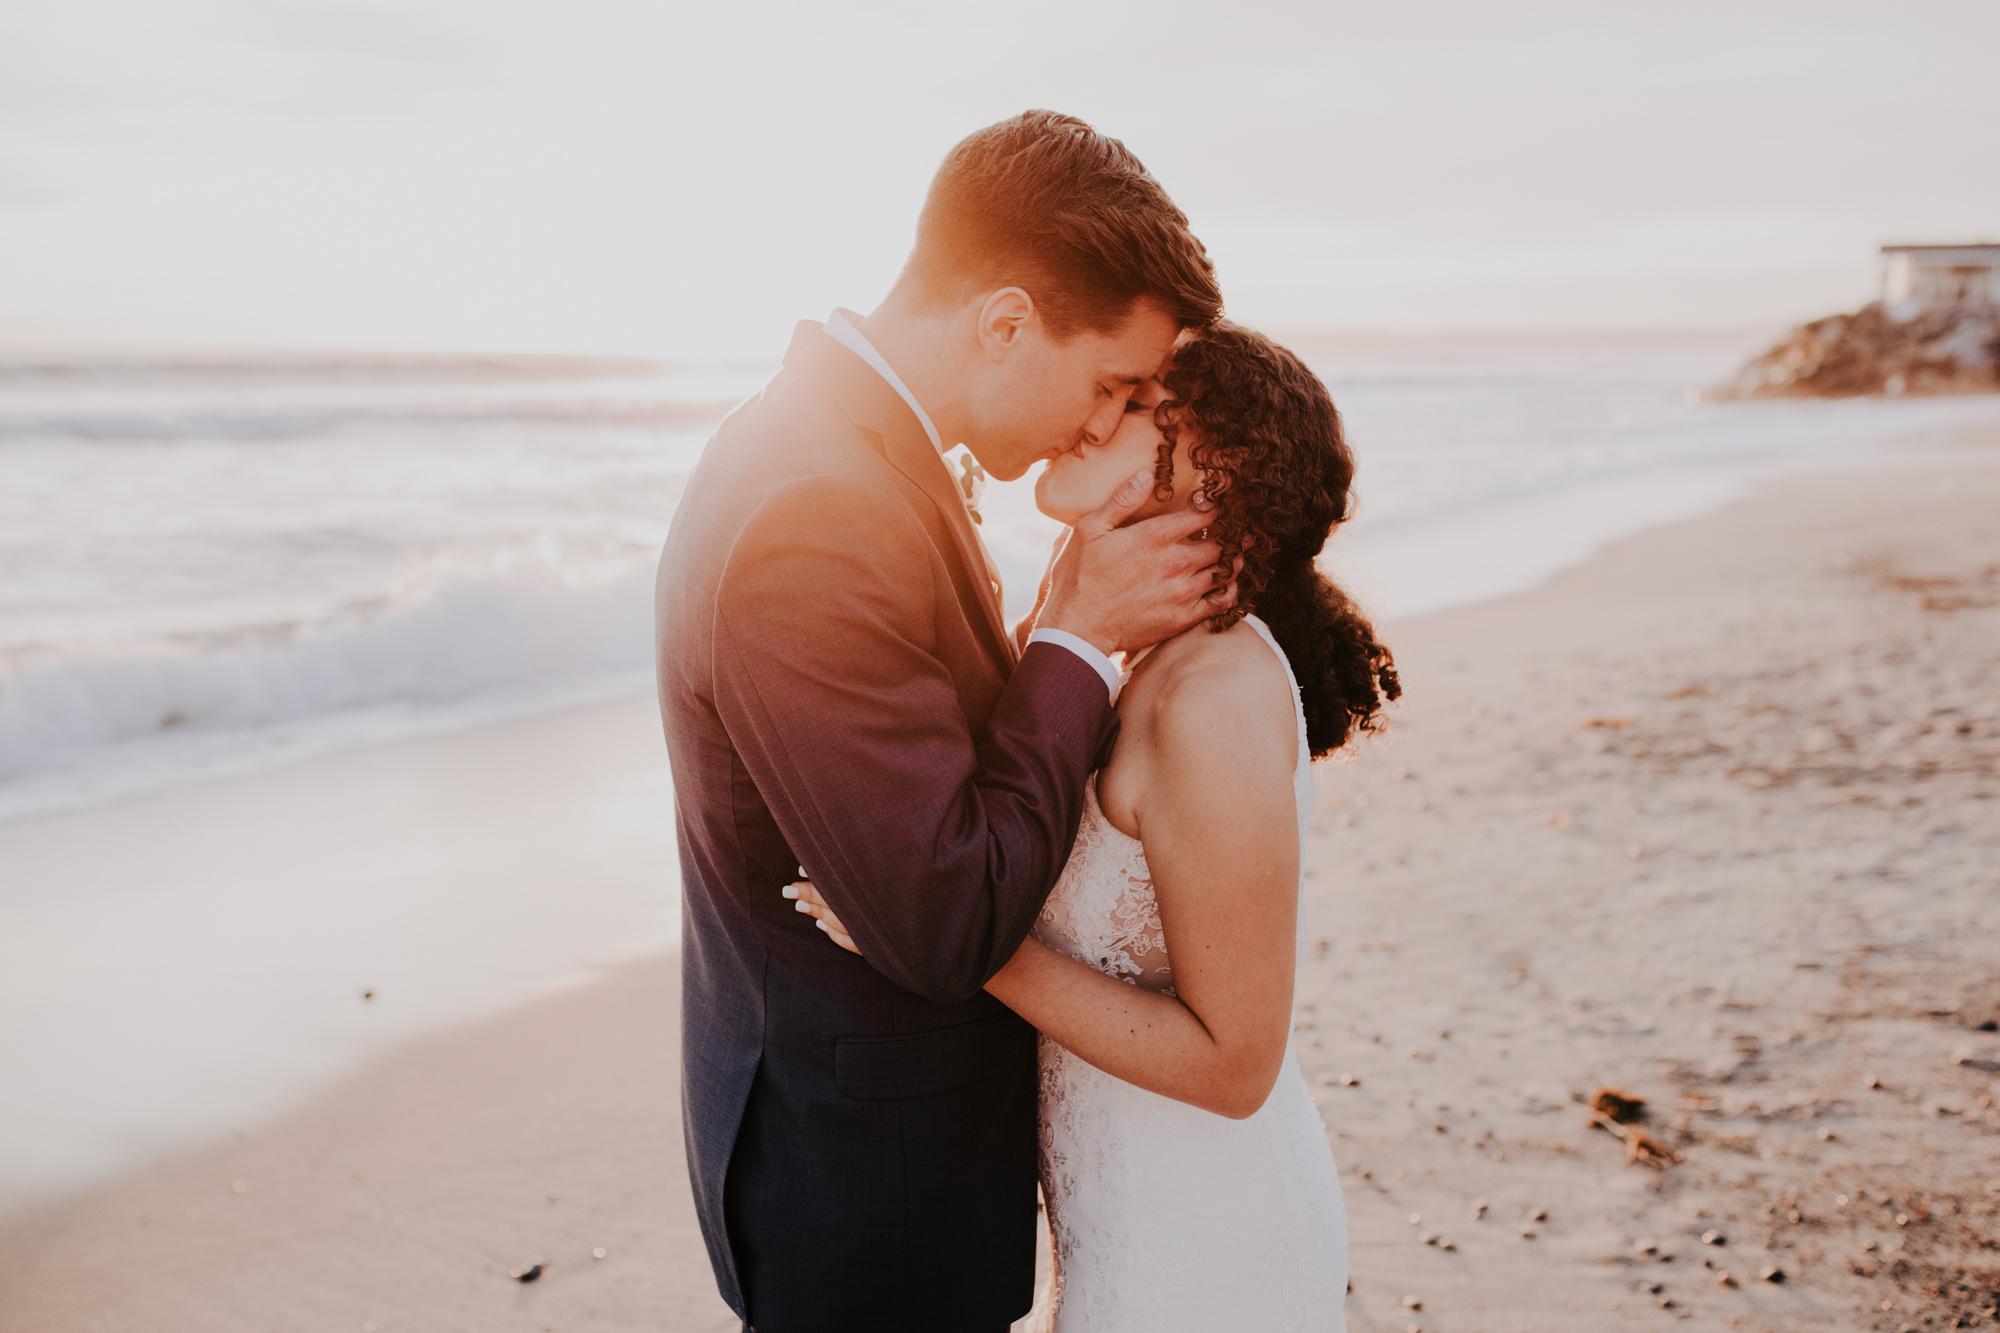 131-destination-wedding-san-clemente-california.jpg